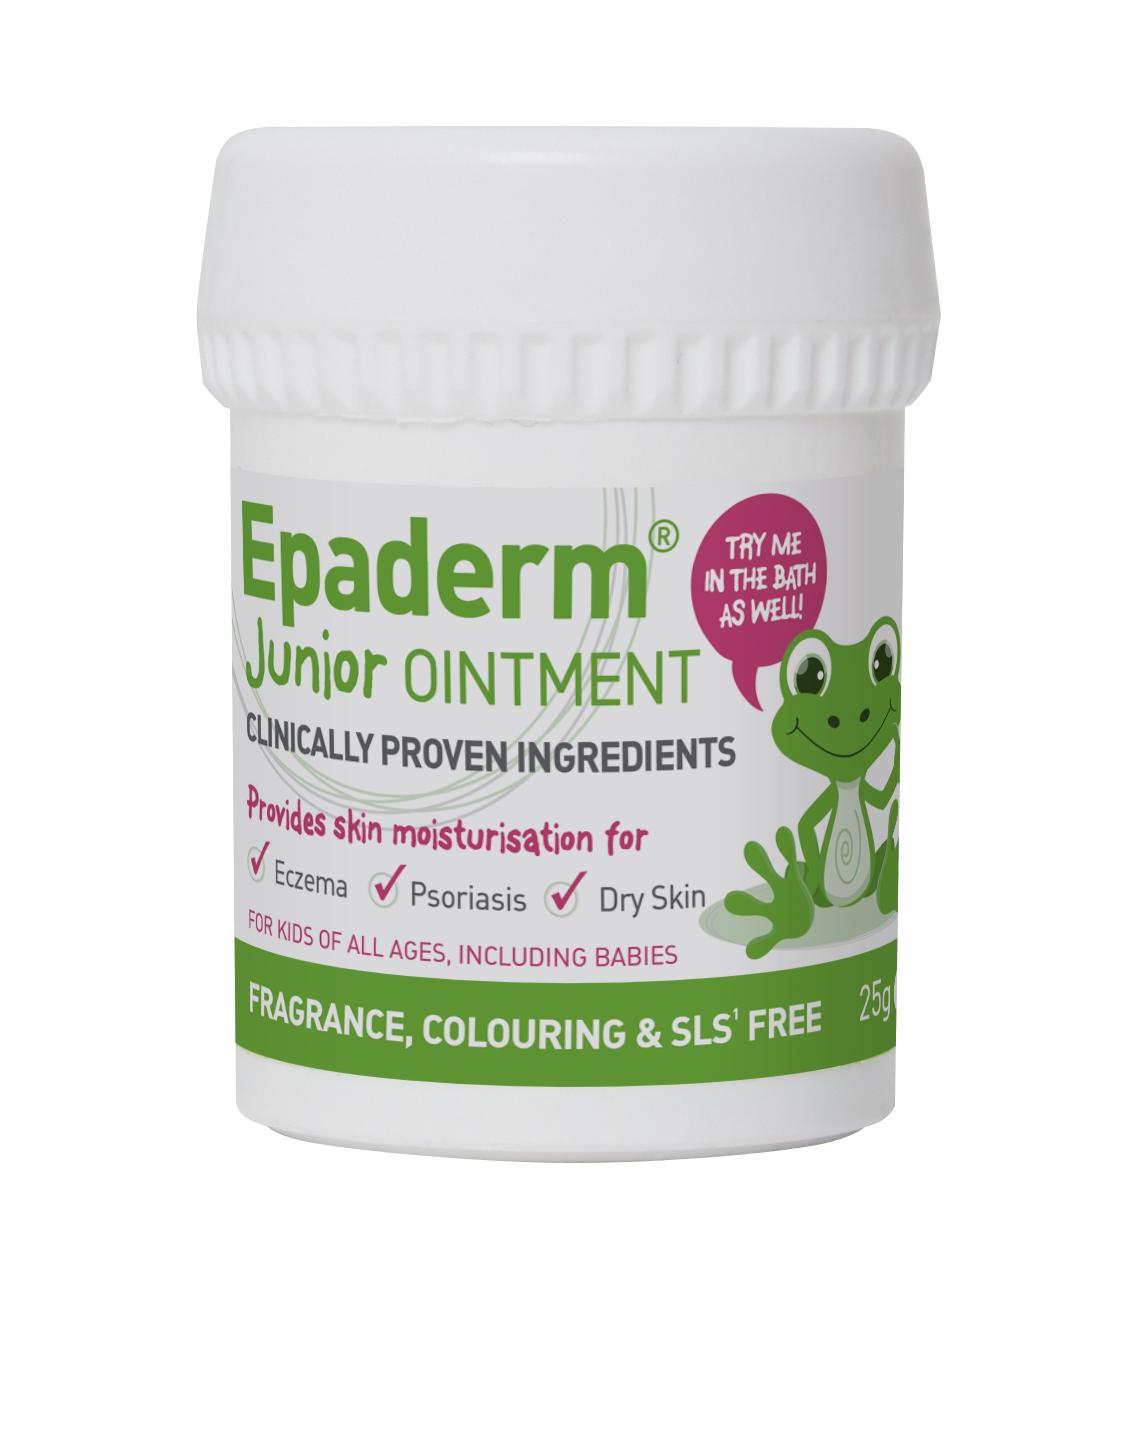 Epaderm Junior Emollient image